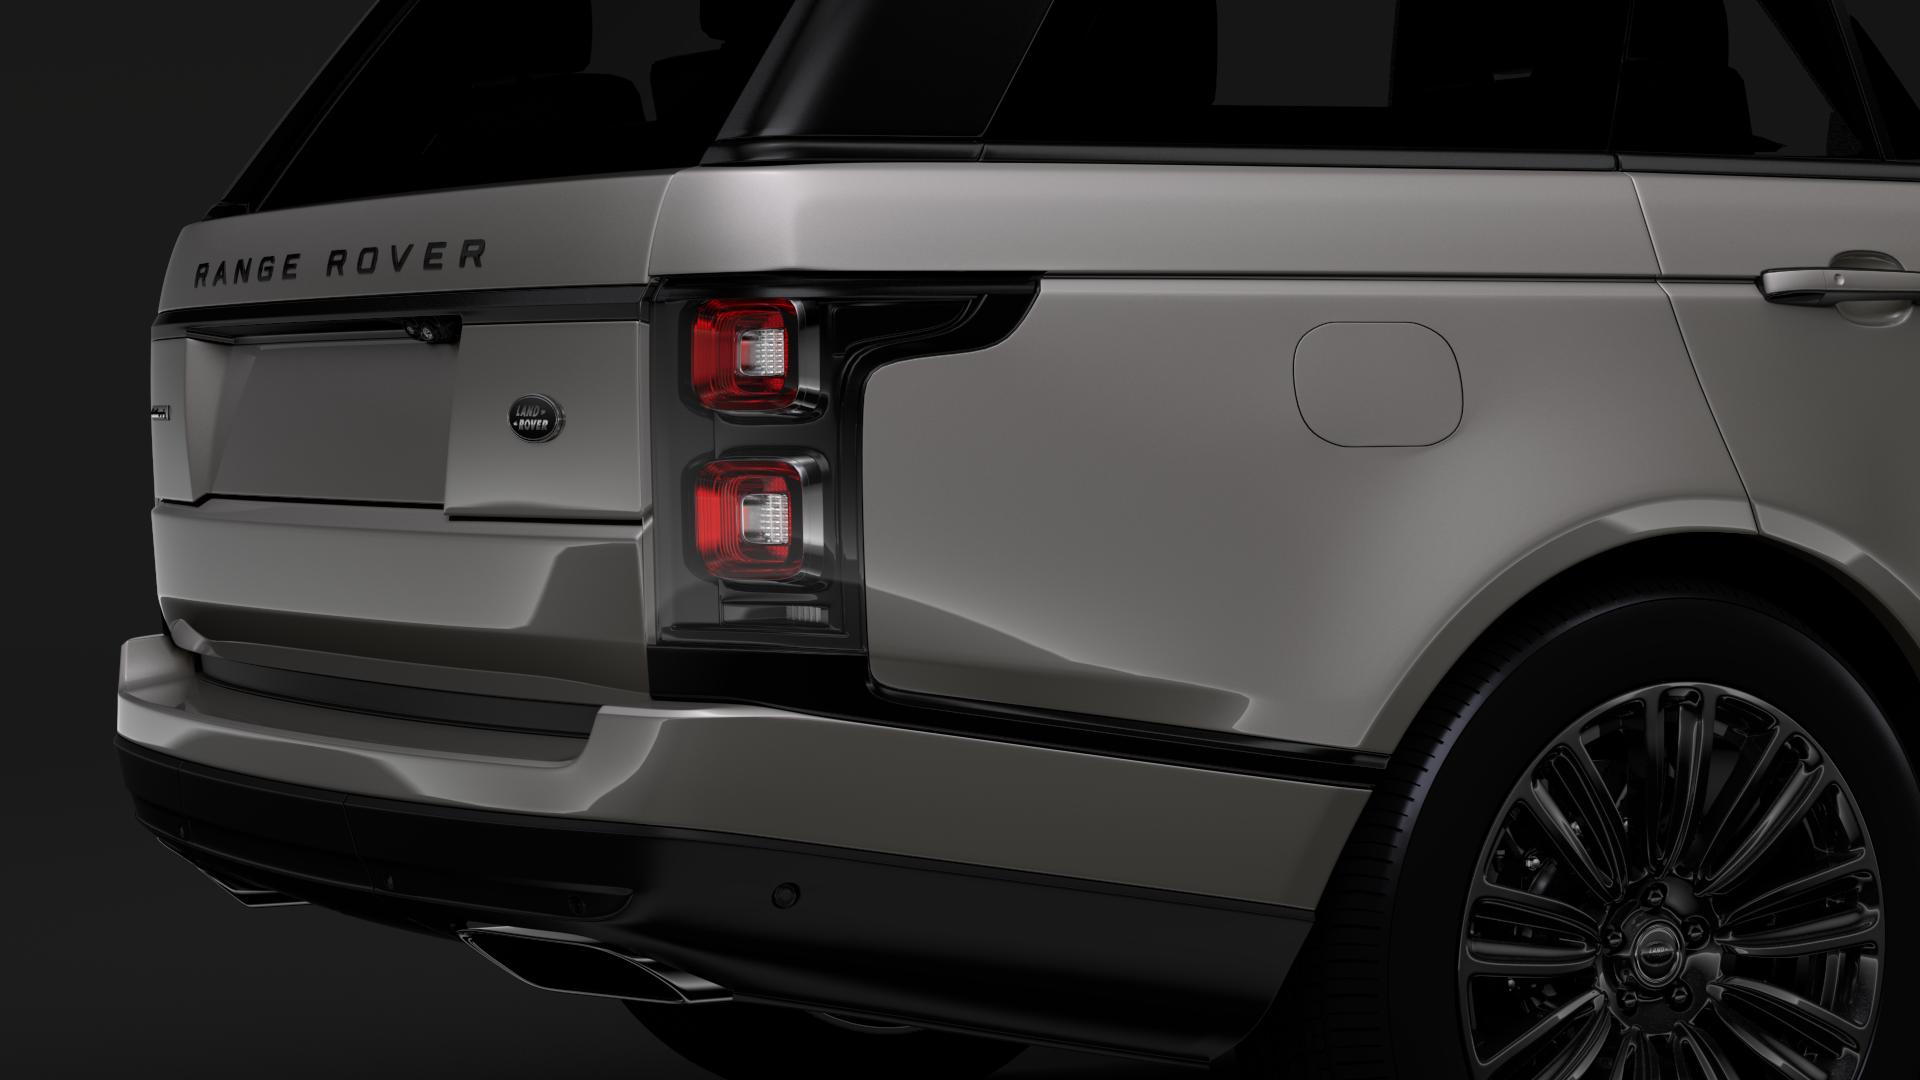 range rover autobiography hybrid (l405) 2018 3d model max fbx c4d lwo ma mb hrc xsi obj 278147